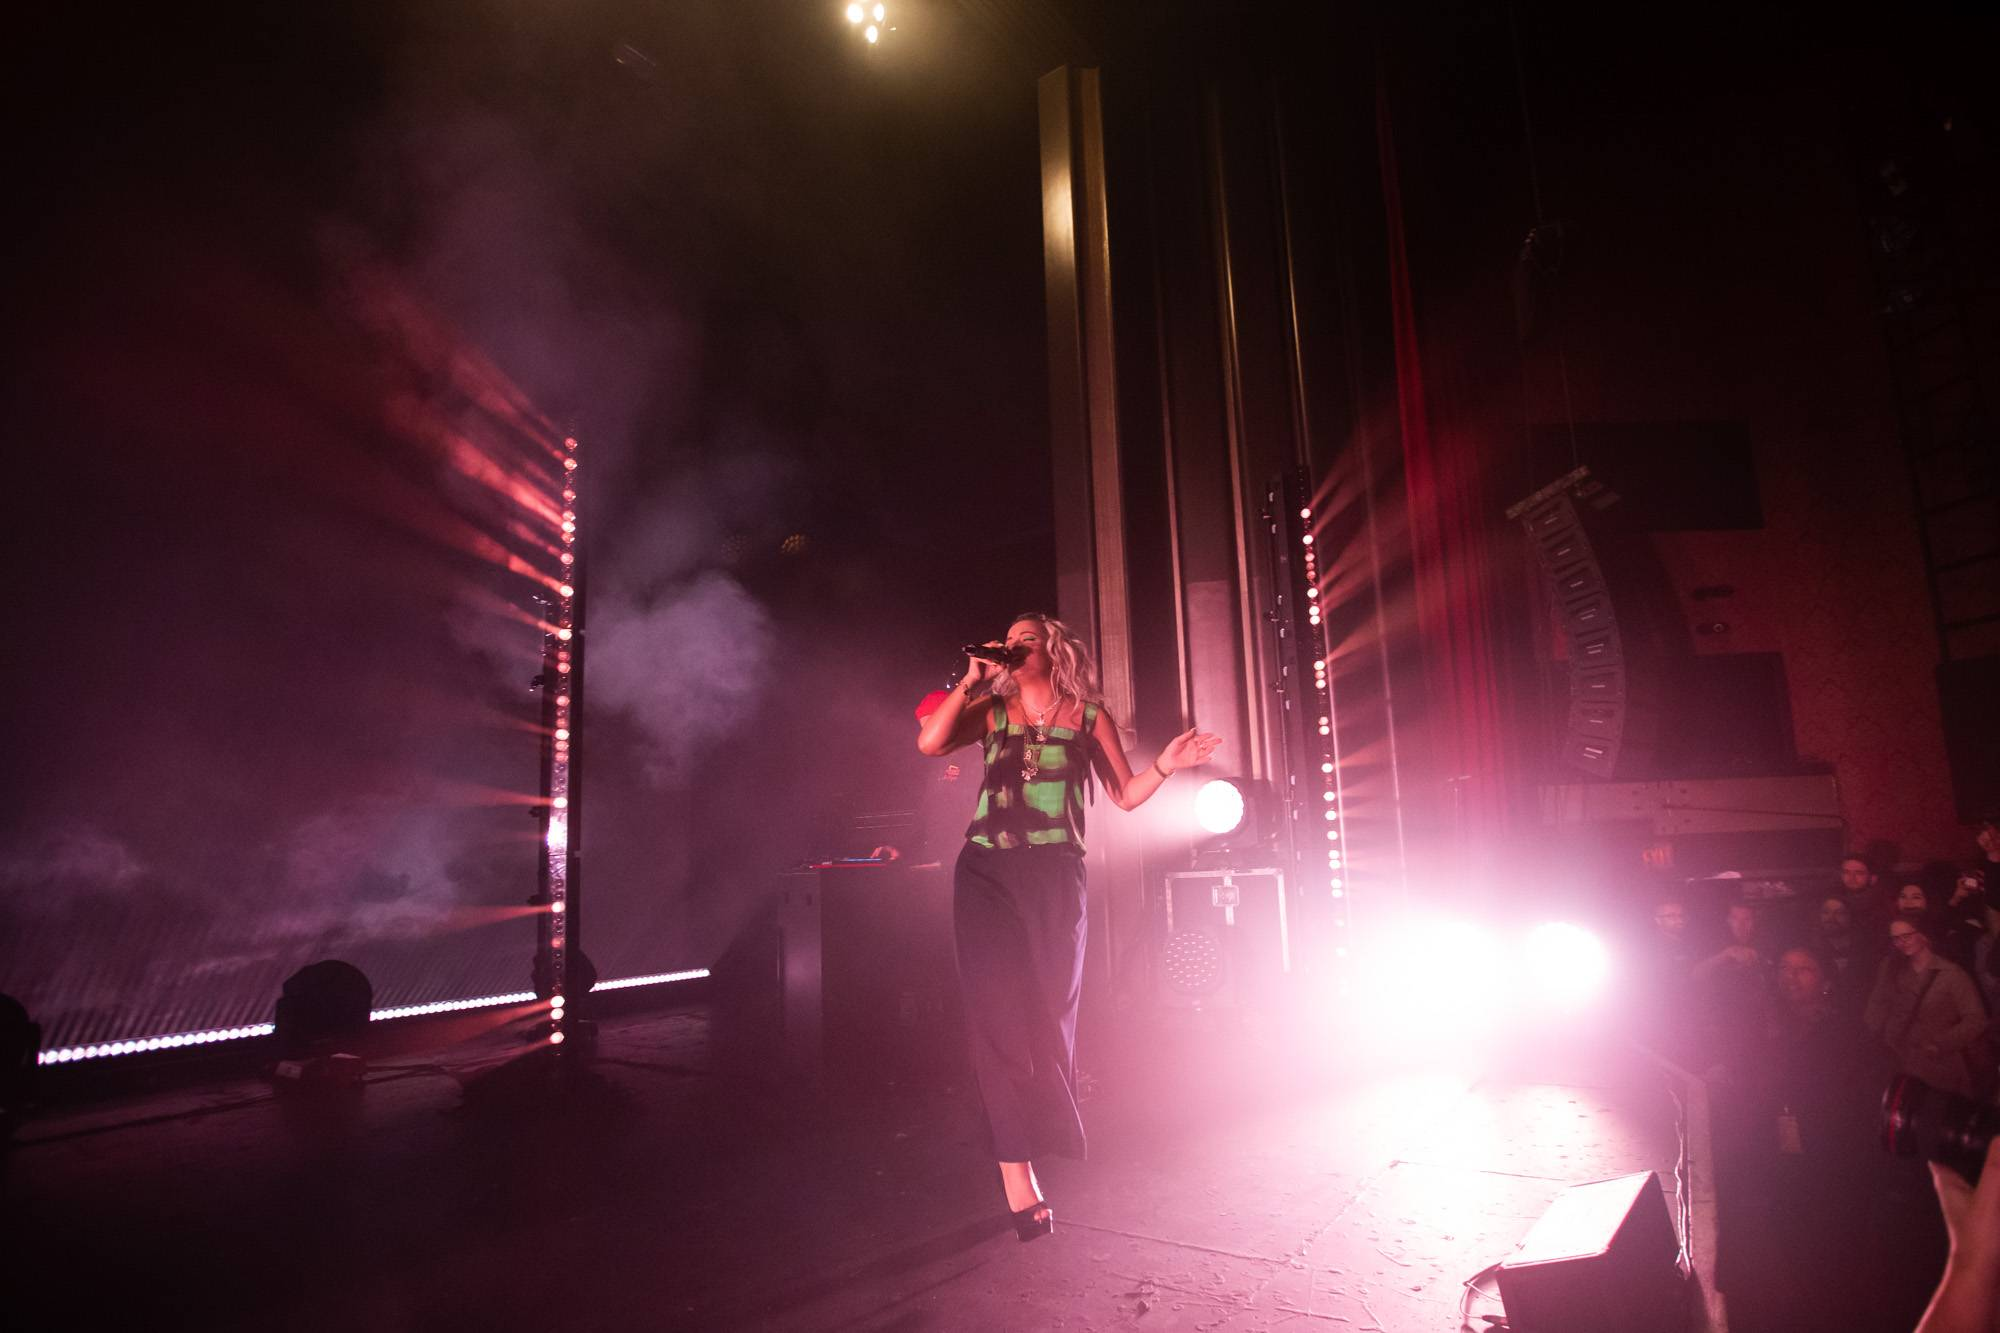 Lily Allen at the Vogue Theatre, Vancouver, Nov 9 2018. Kirk Chantraine photo.